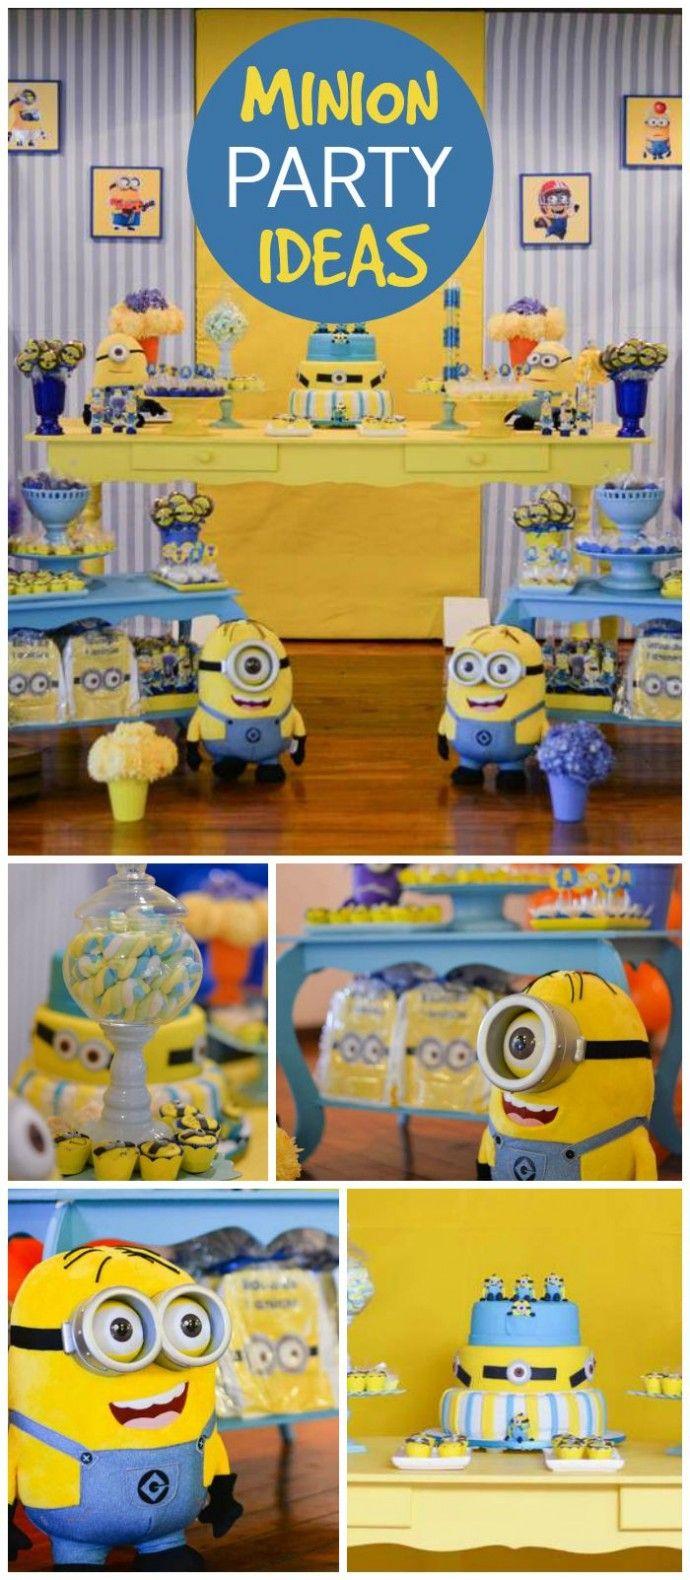 pinterest Aniversrio Pinterest Birthdays and Birthday party ideas